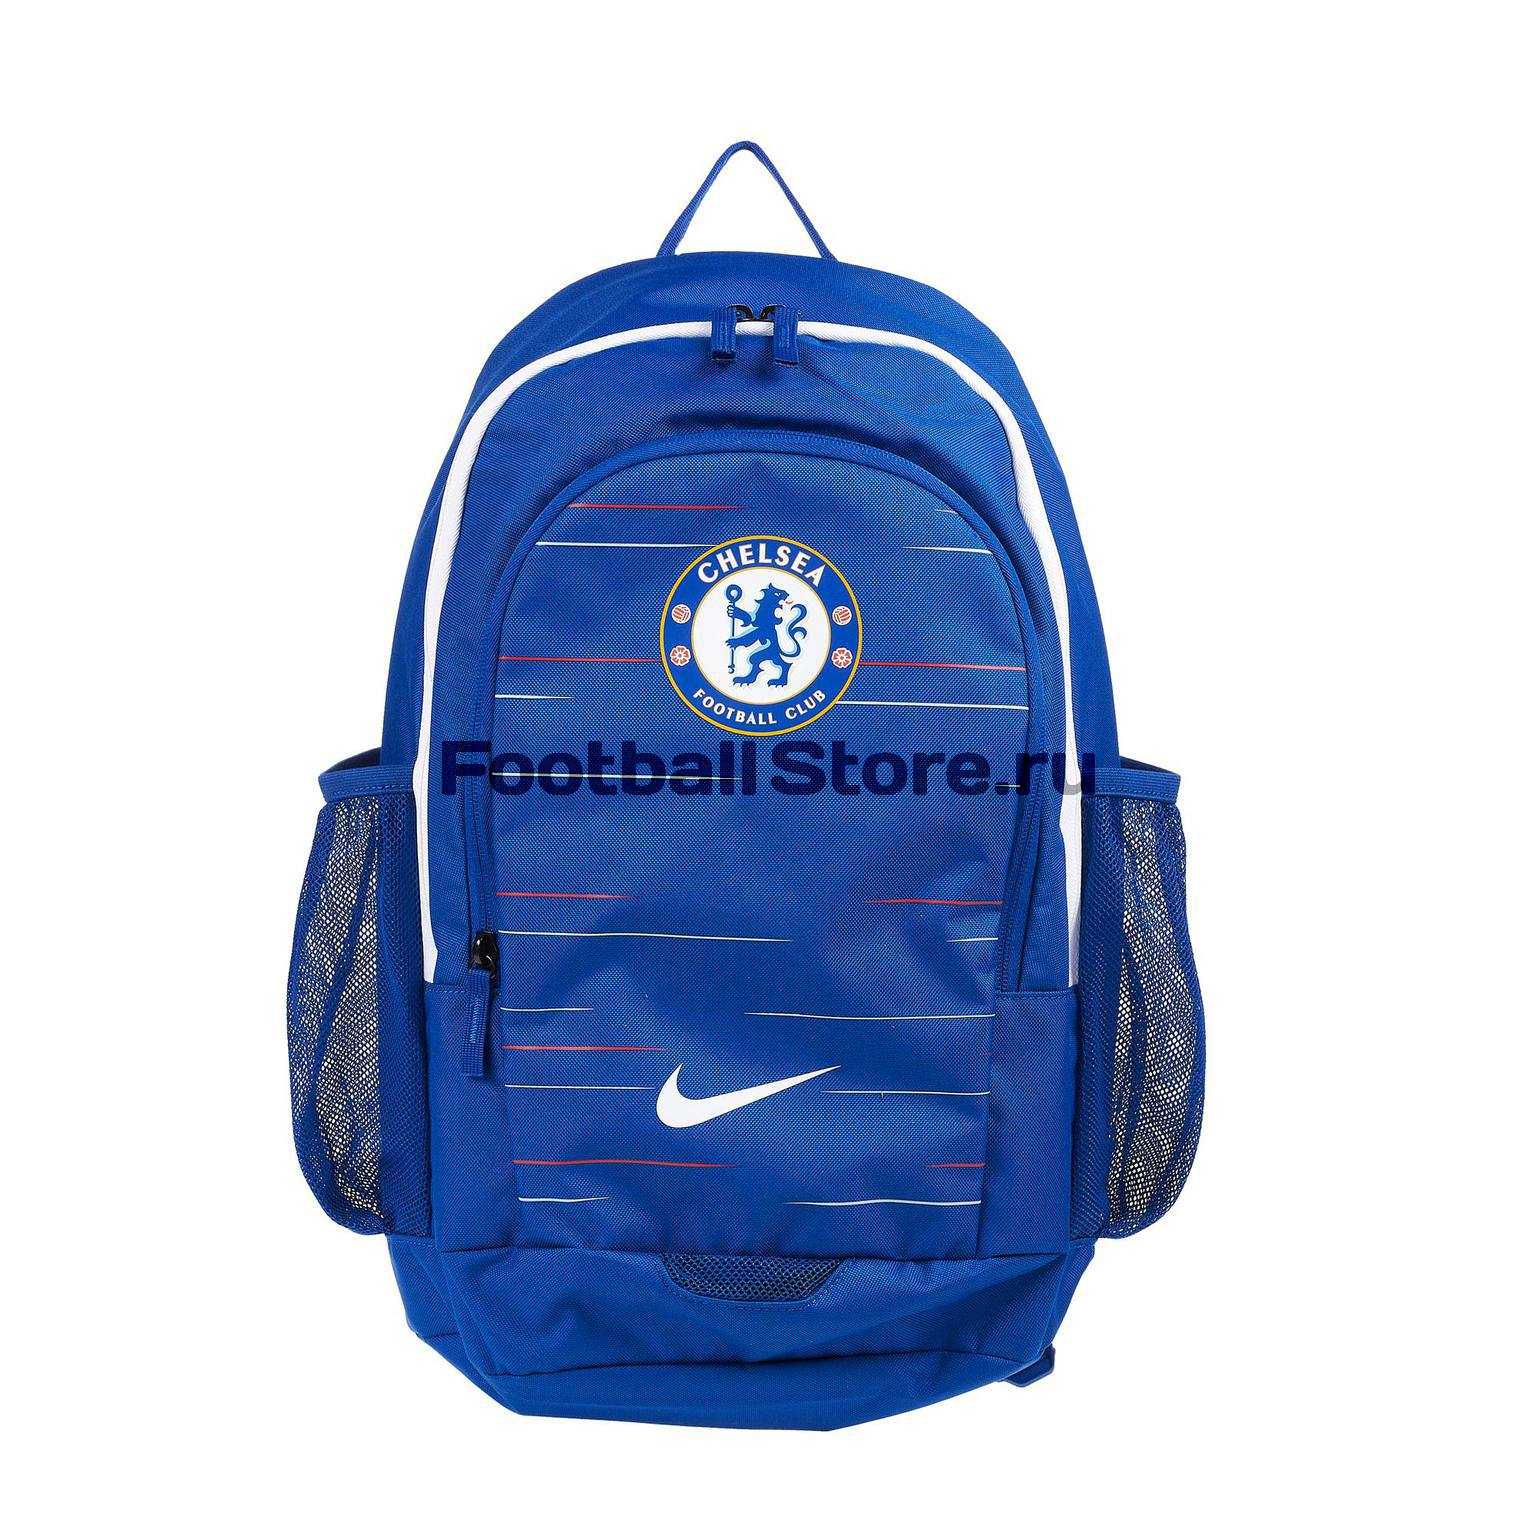 Рюкзак Nike Chelsea BA5494-496 цена 2017